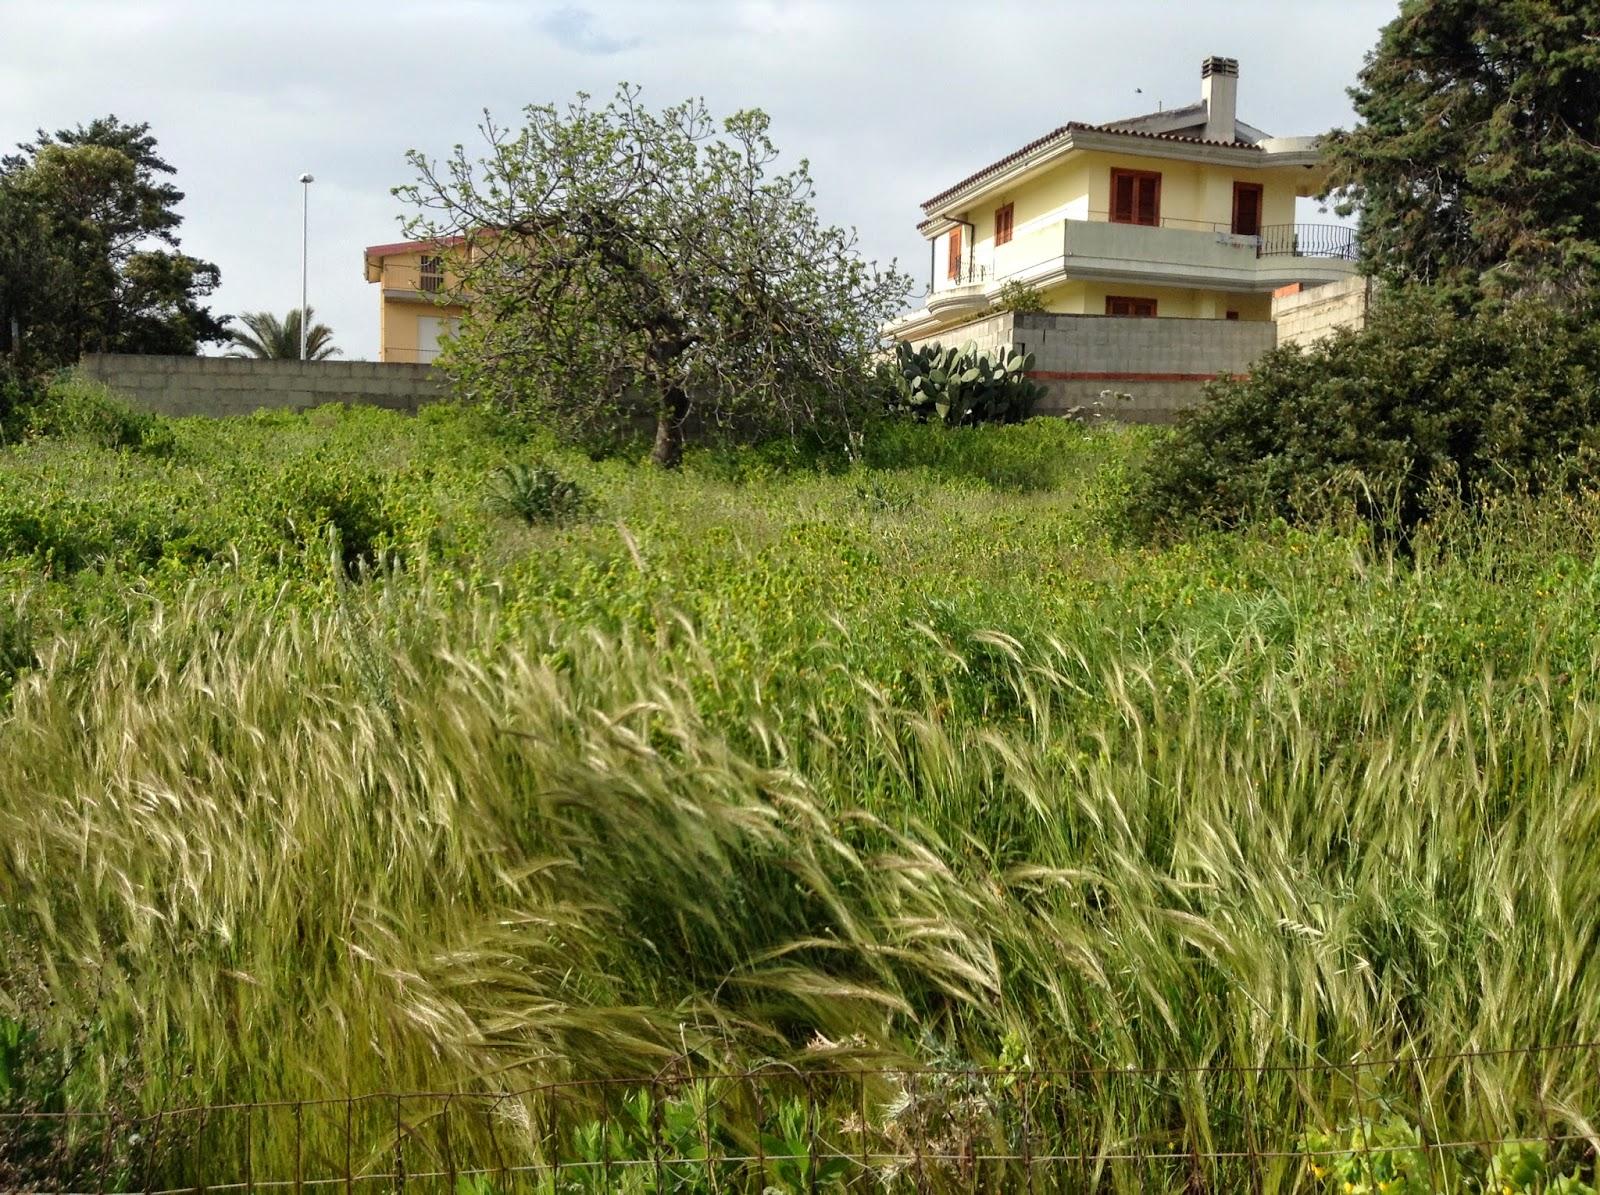 Barraccamanna - Sardinian suburb landscape